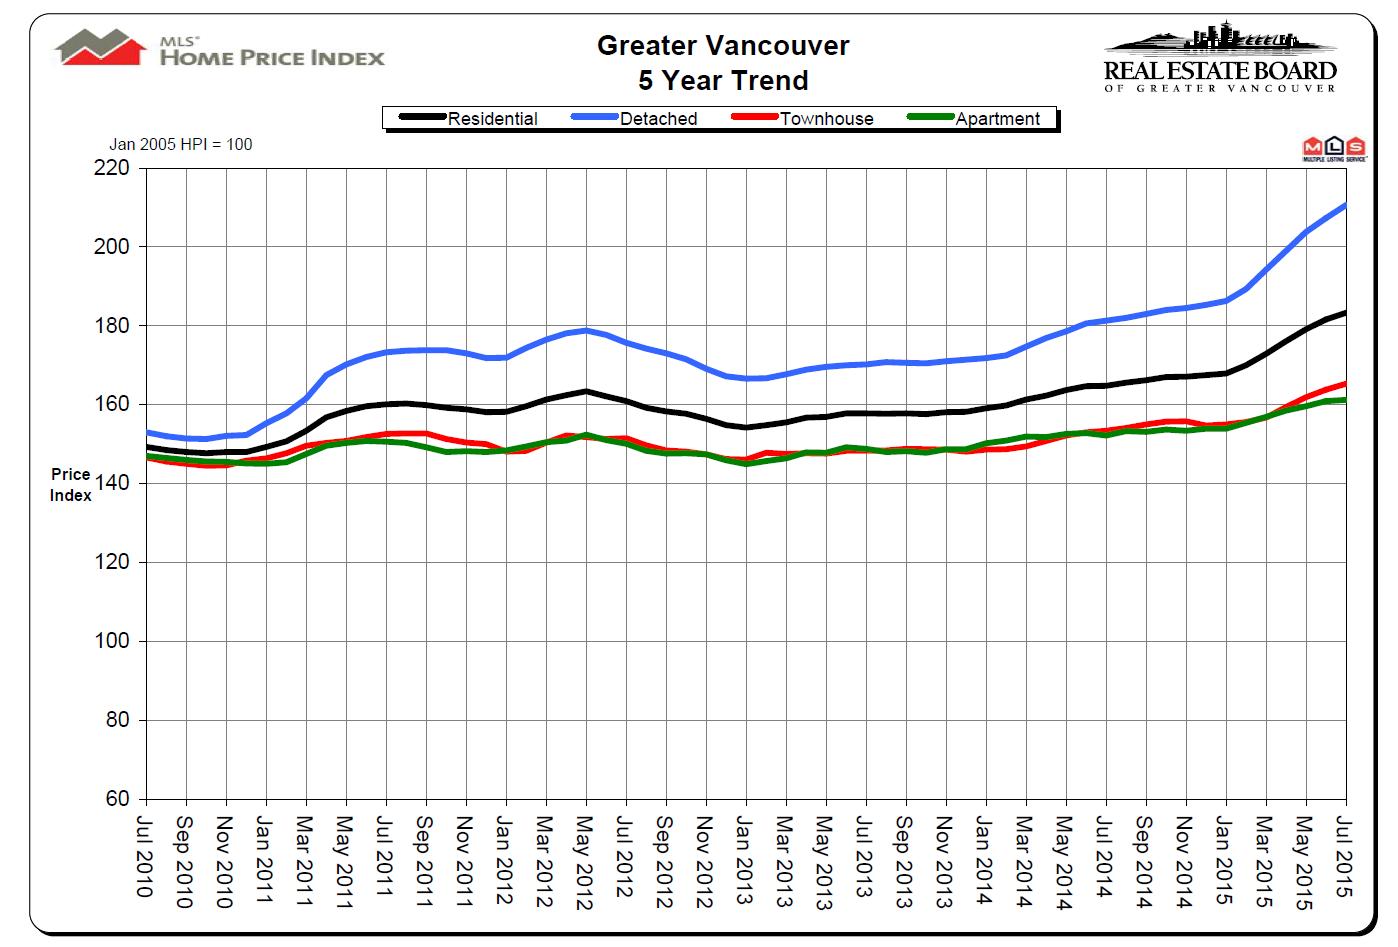 REBGV Price Index to July 2015 Mike Stewart Vancouver Realtor